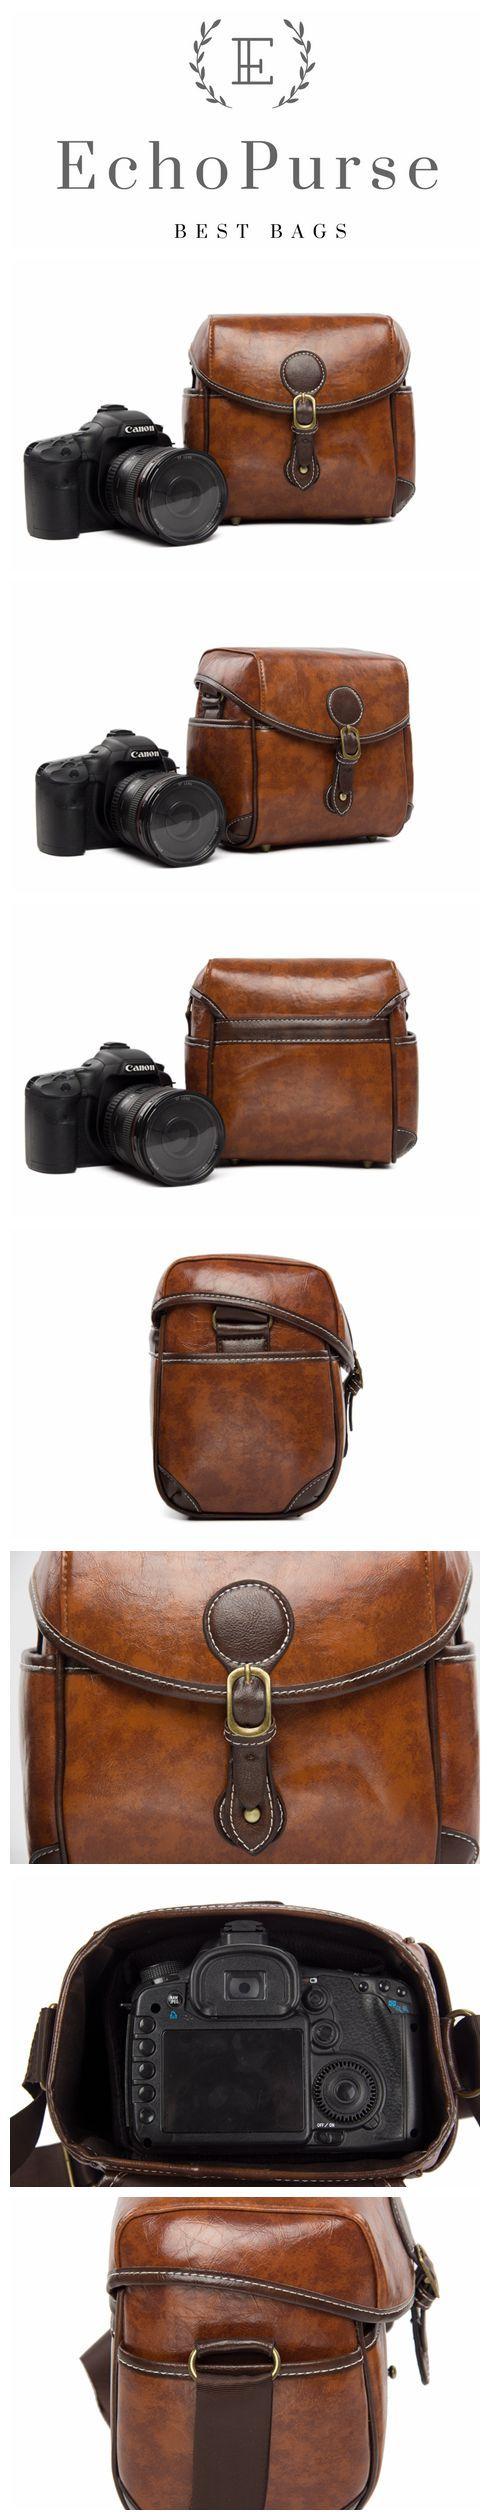 PU Leather DSLR Camera Purse, Vintage Brown SLR Camera Case 288 #camerapurse